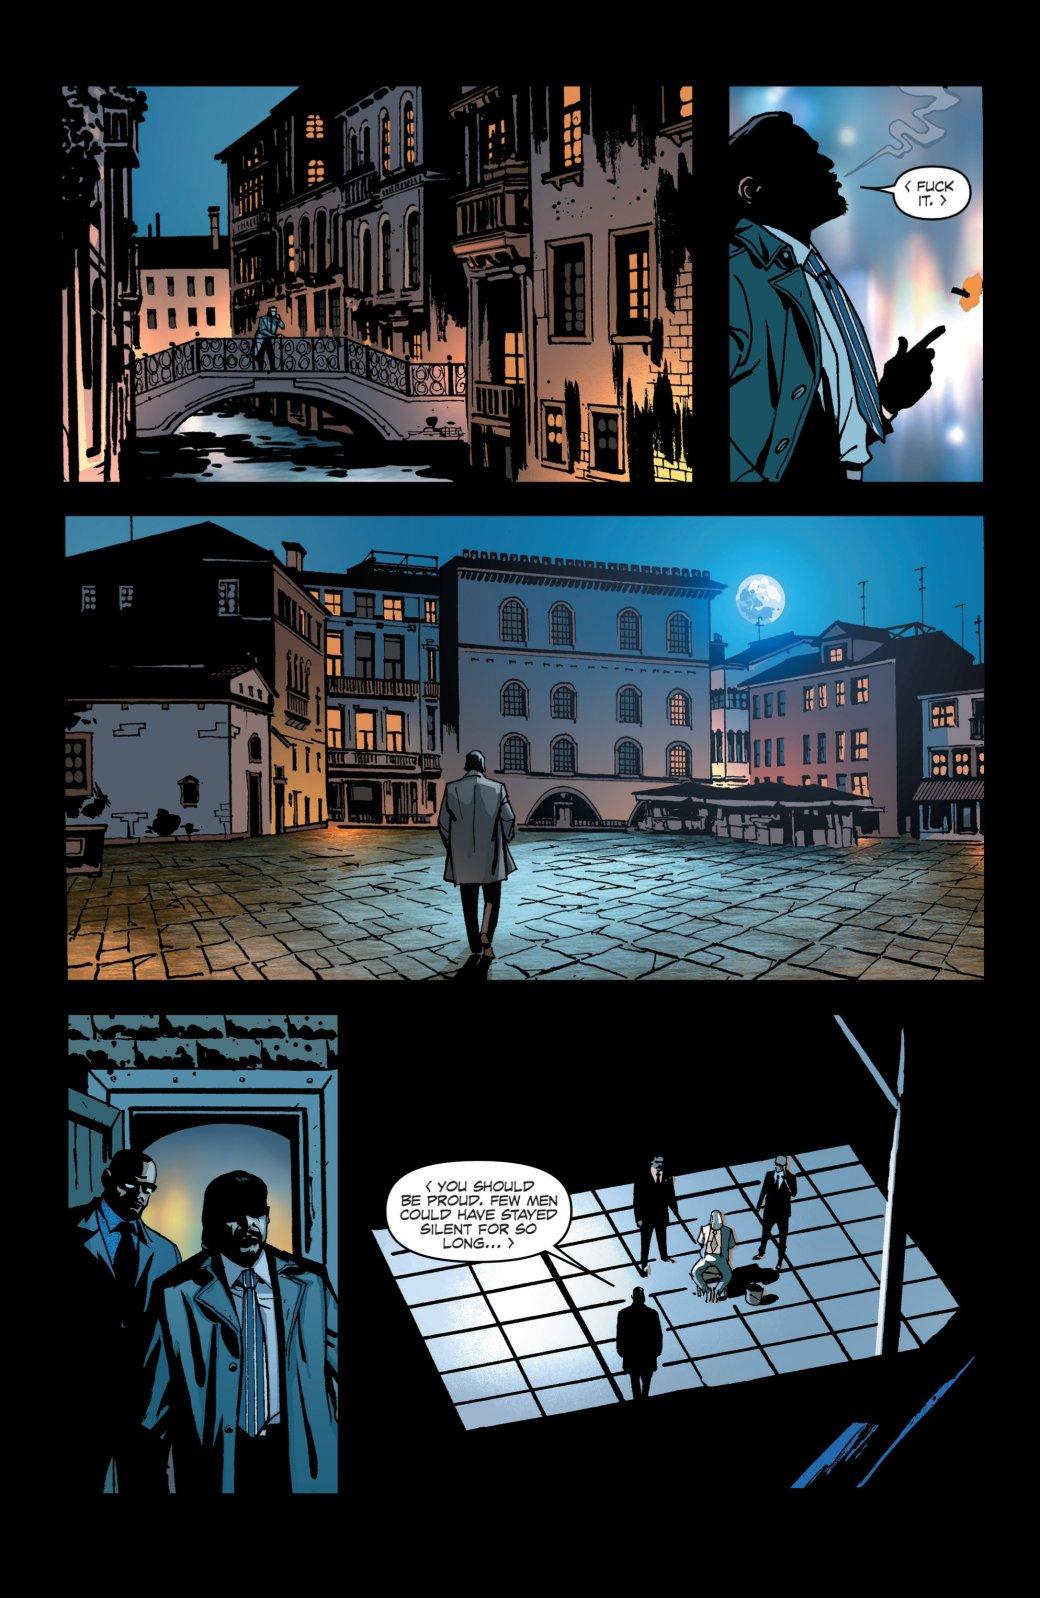 Уже скучаете по«Ходячим мертвецам»? Попробуйте комикс Киркмана Thief ofThieves огениальном воре